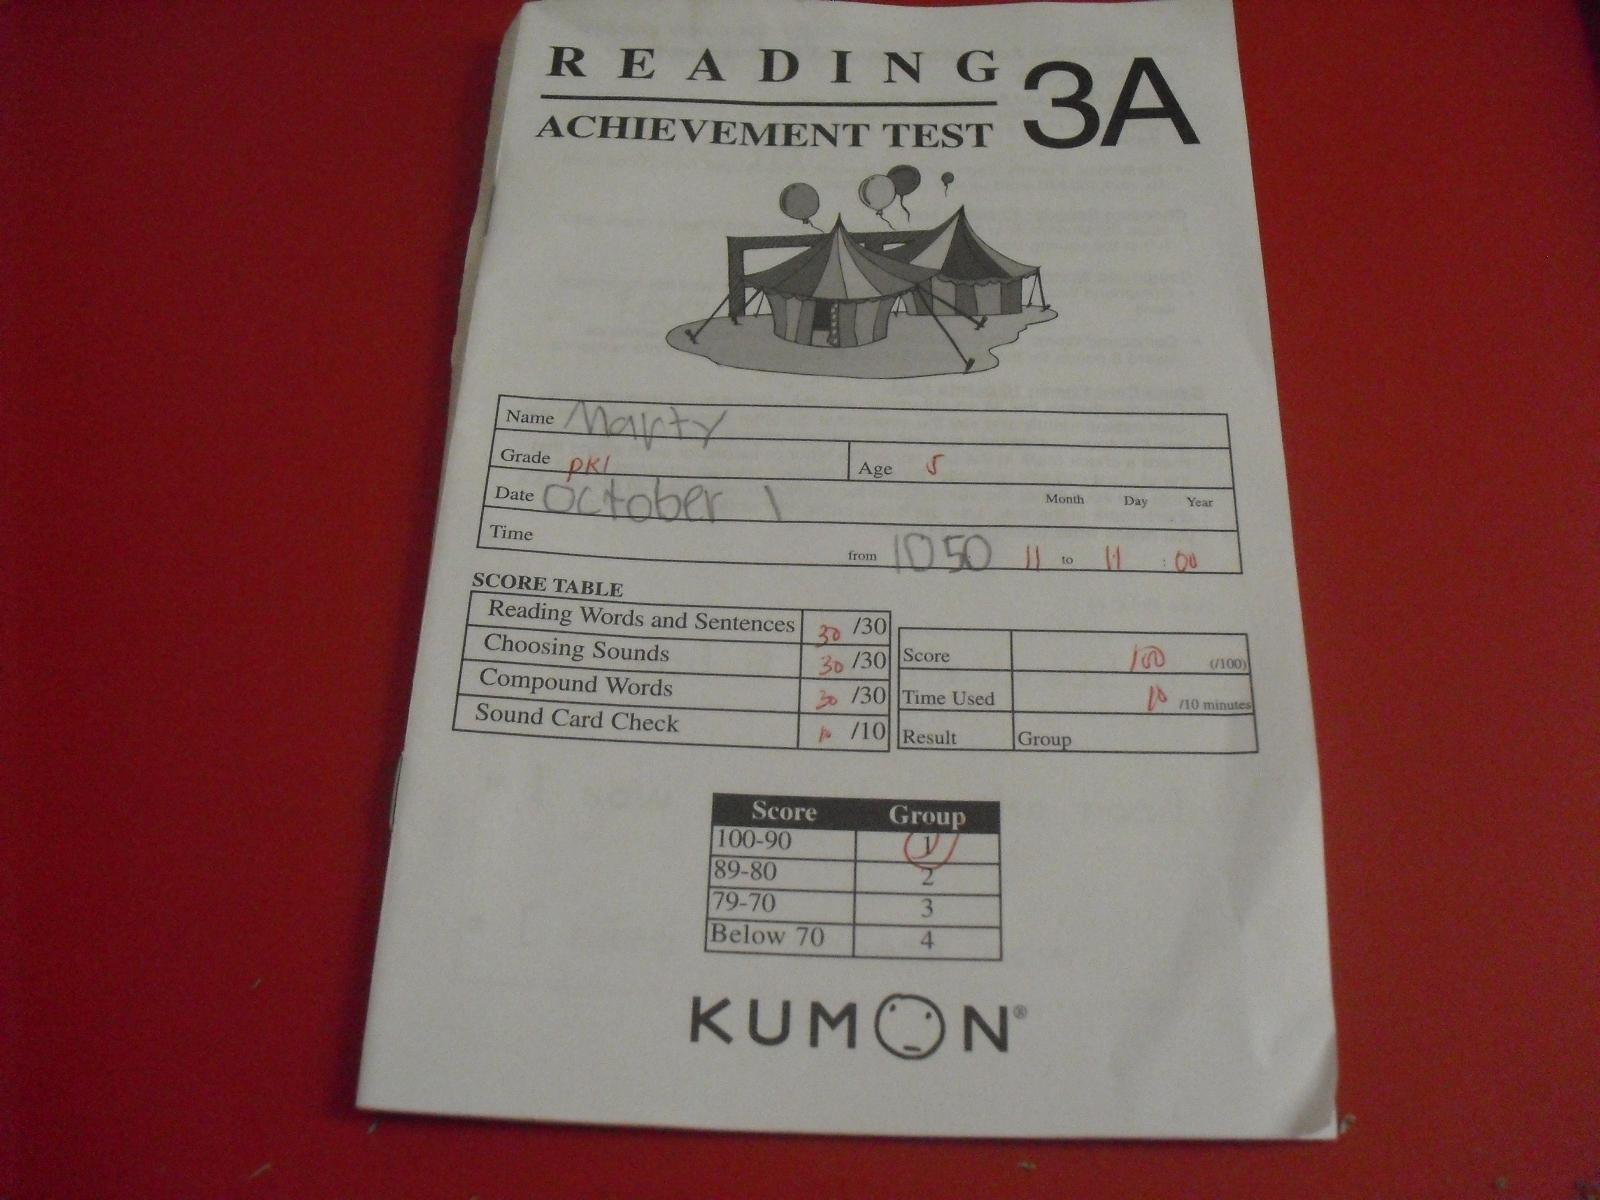 Kumon Worksheet Level 3a